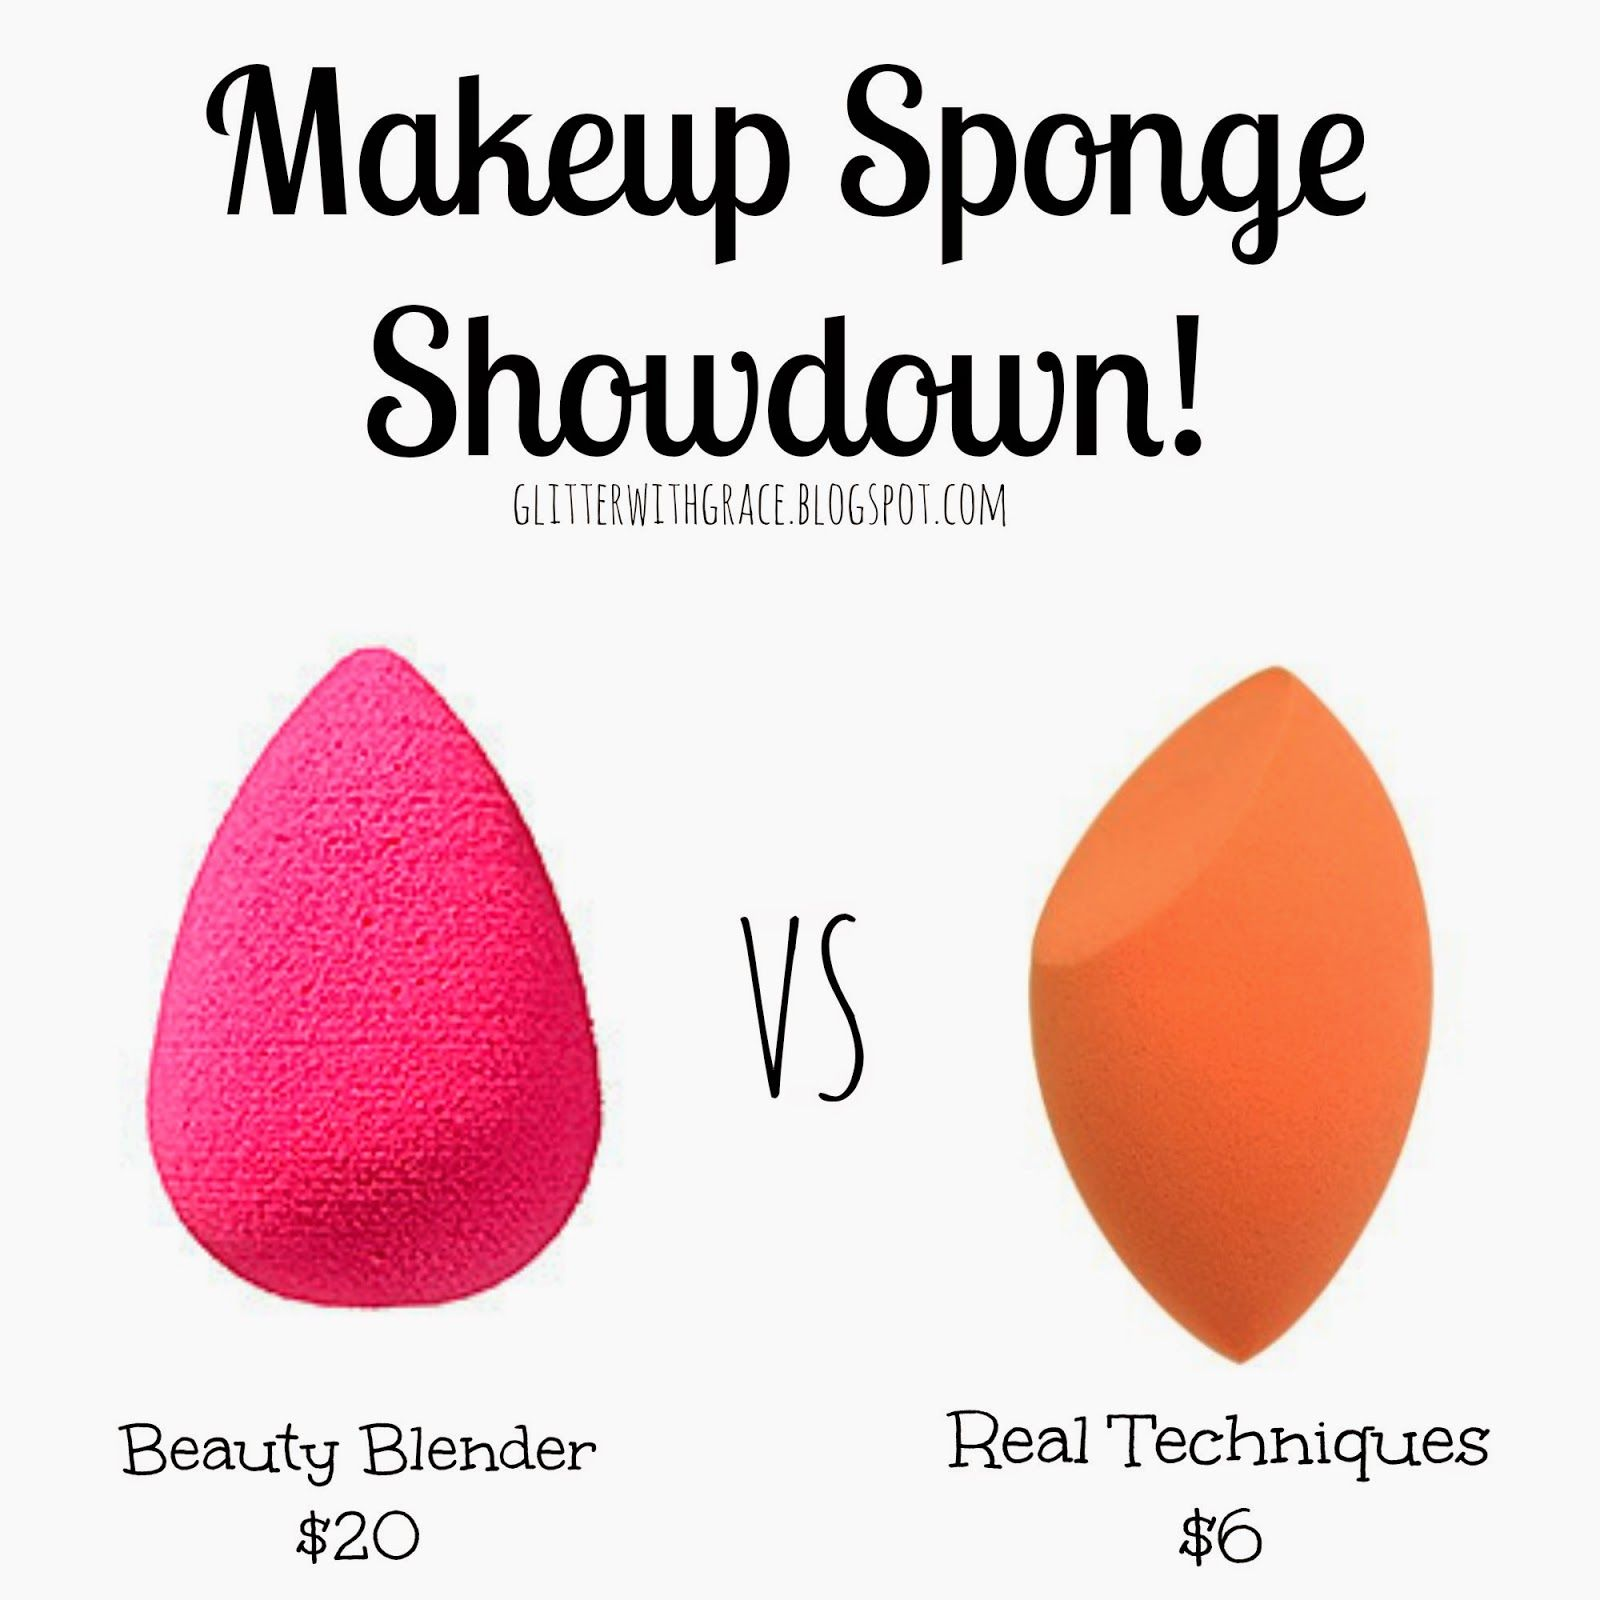 Glitter with Grace Makeup Sponge Showdown! Beauty Blender